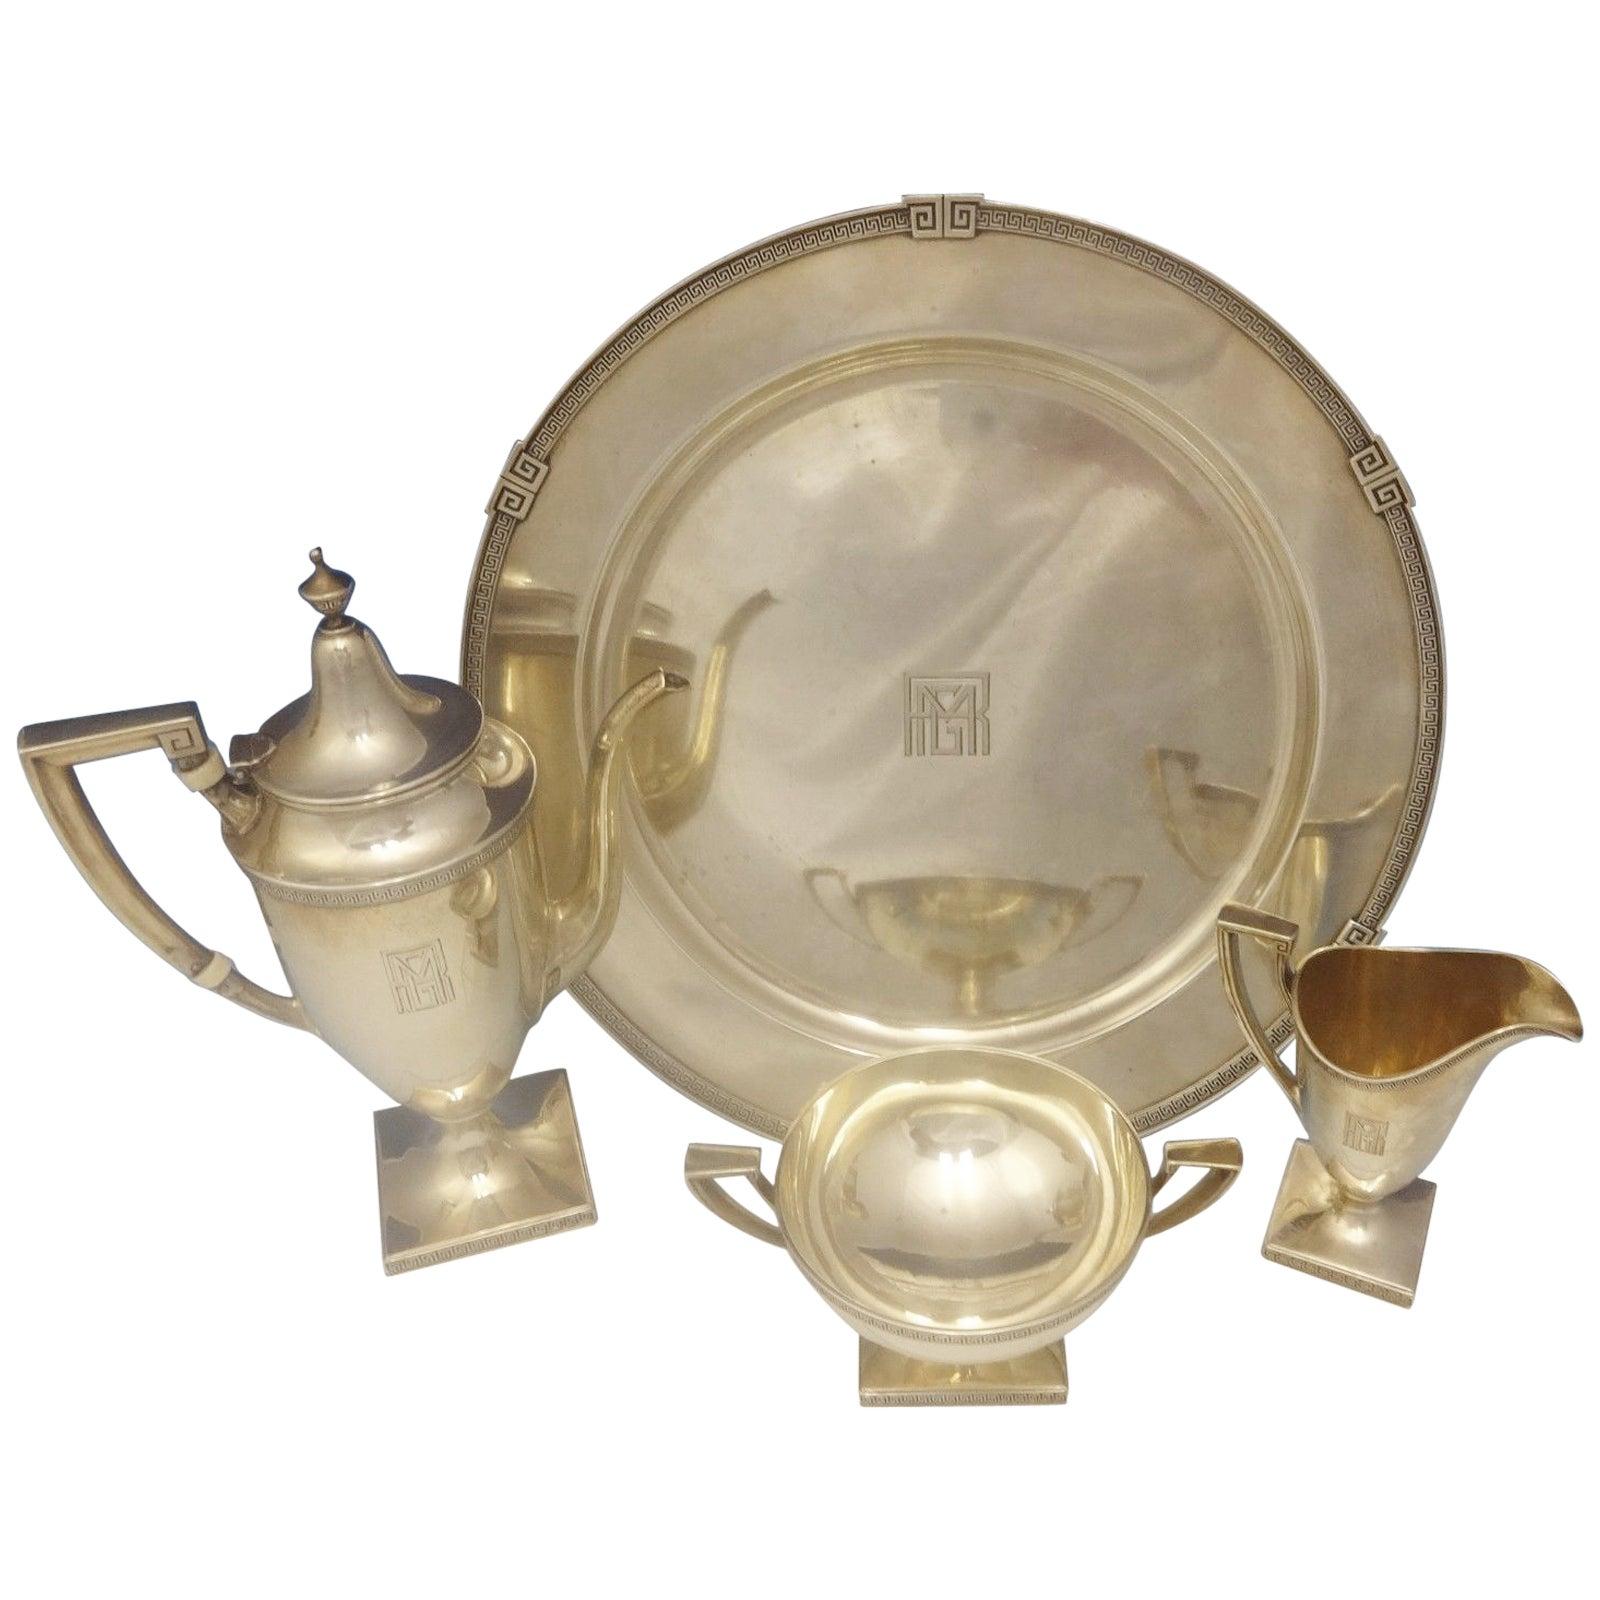 Etruscan by Gorham Sterling Silver Demitasse Tea Set Four-Pieces Hollowware 0366